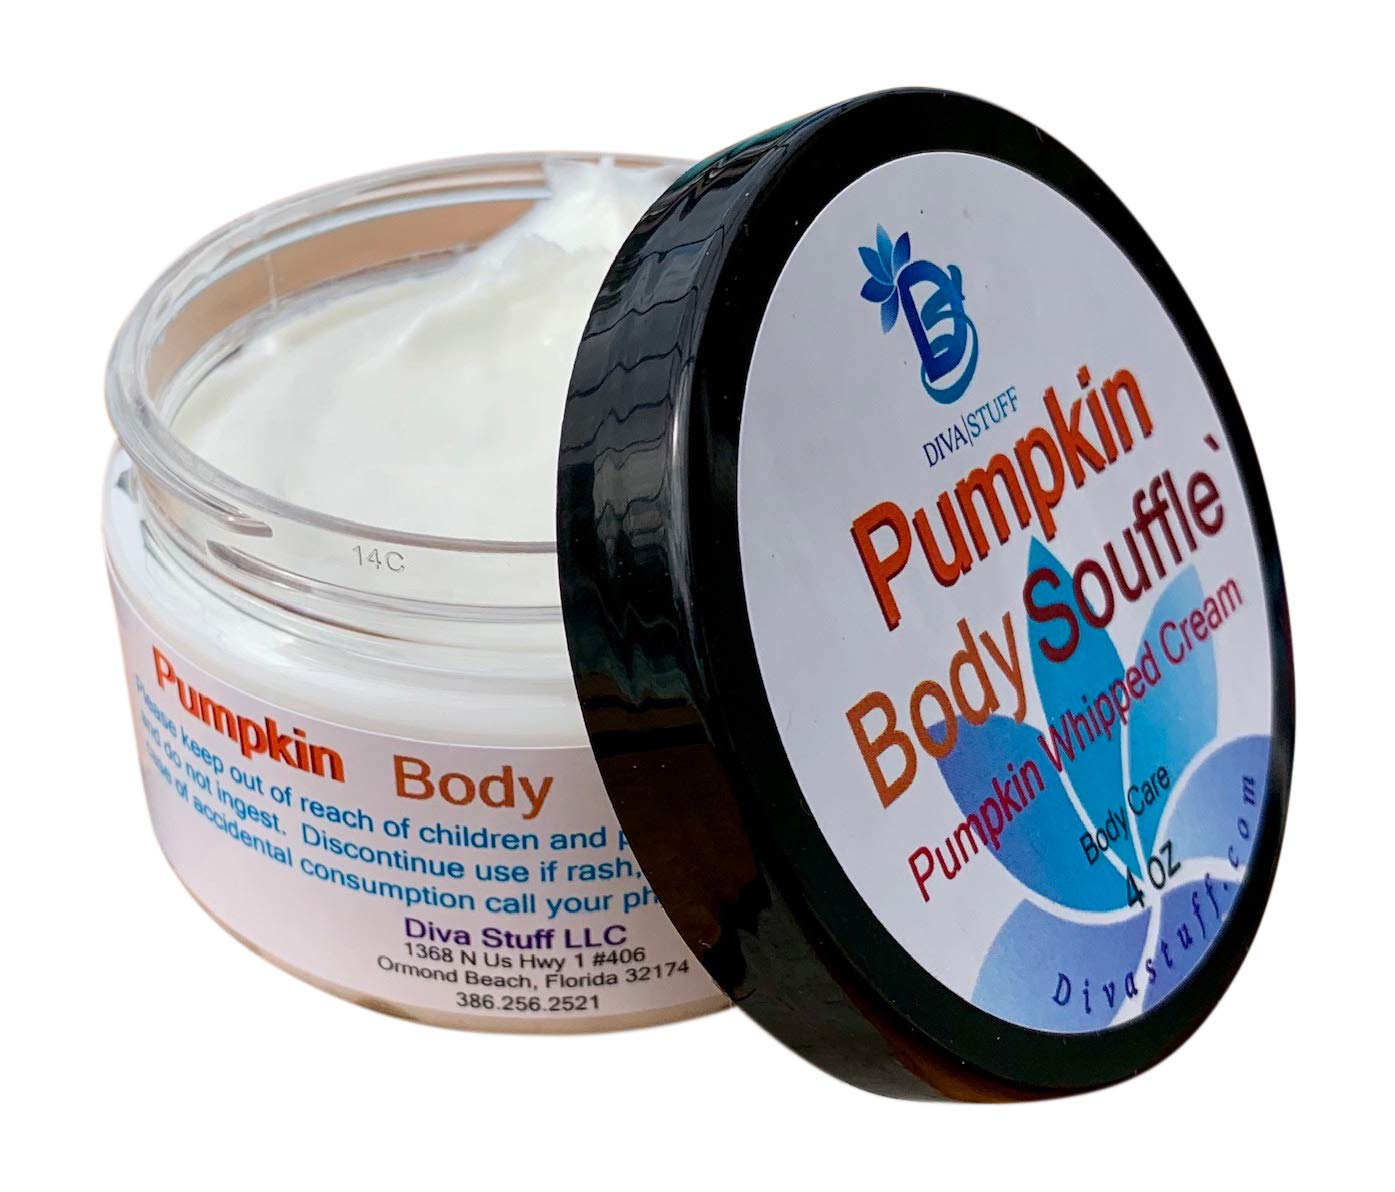 Pumpkin Souffle Body Cream By Diva Stuff, 4 Oz by Diva Stuff